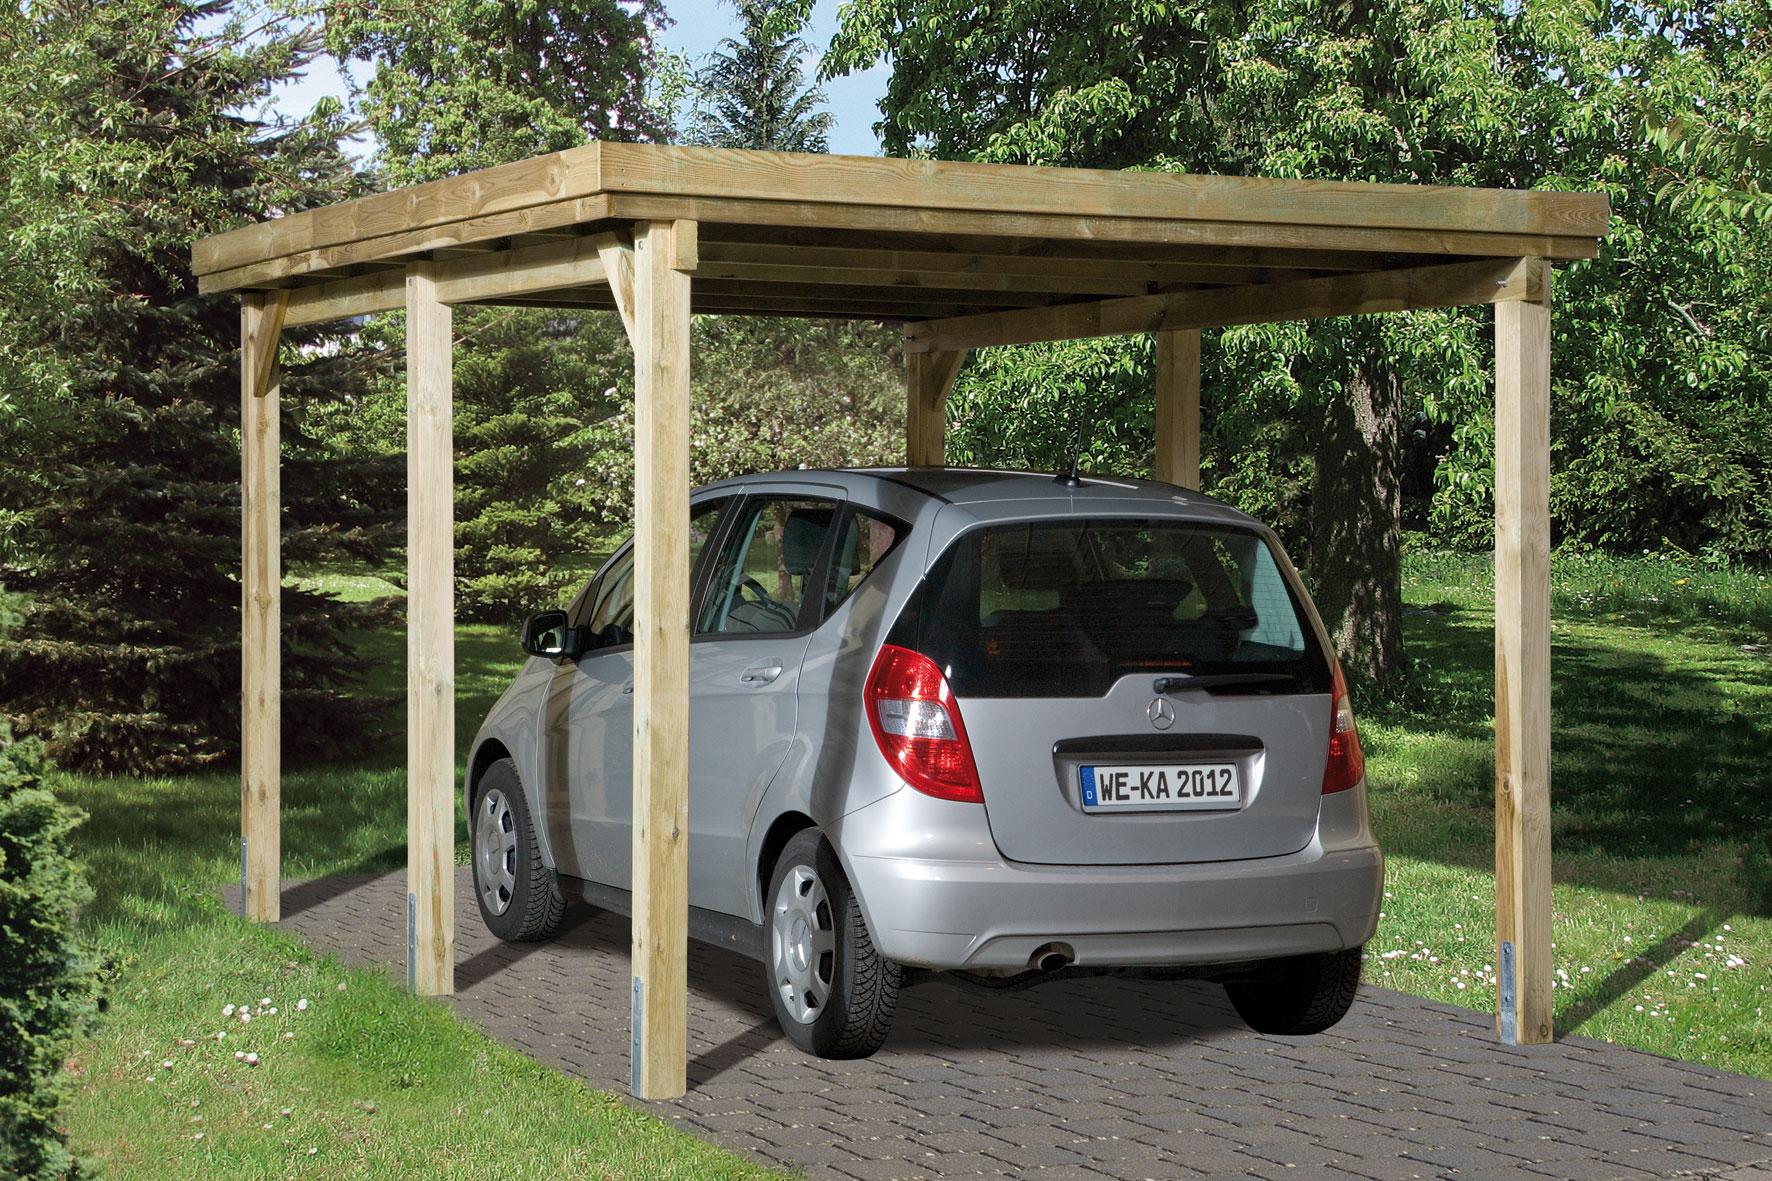 Carport Weka Einzelcarport 617 Gr. 1 Holz kdi + Kunststoff 322x512cm Bild 1